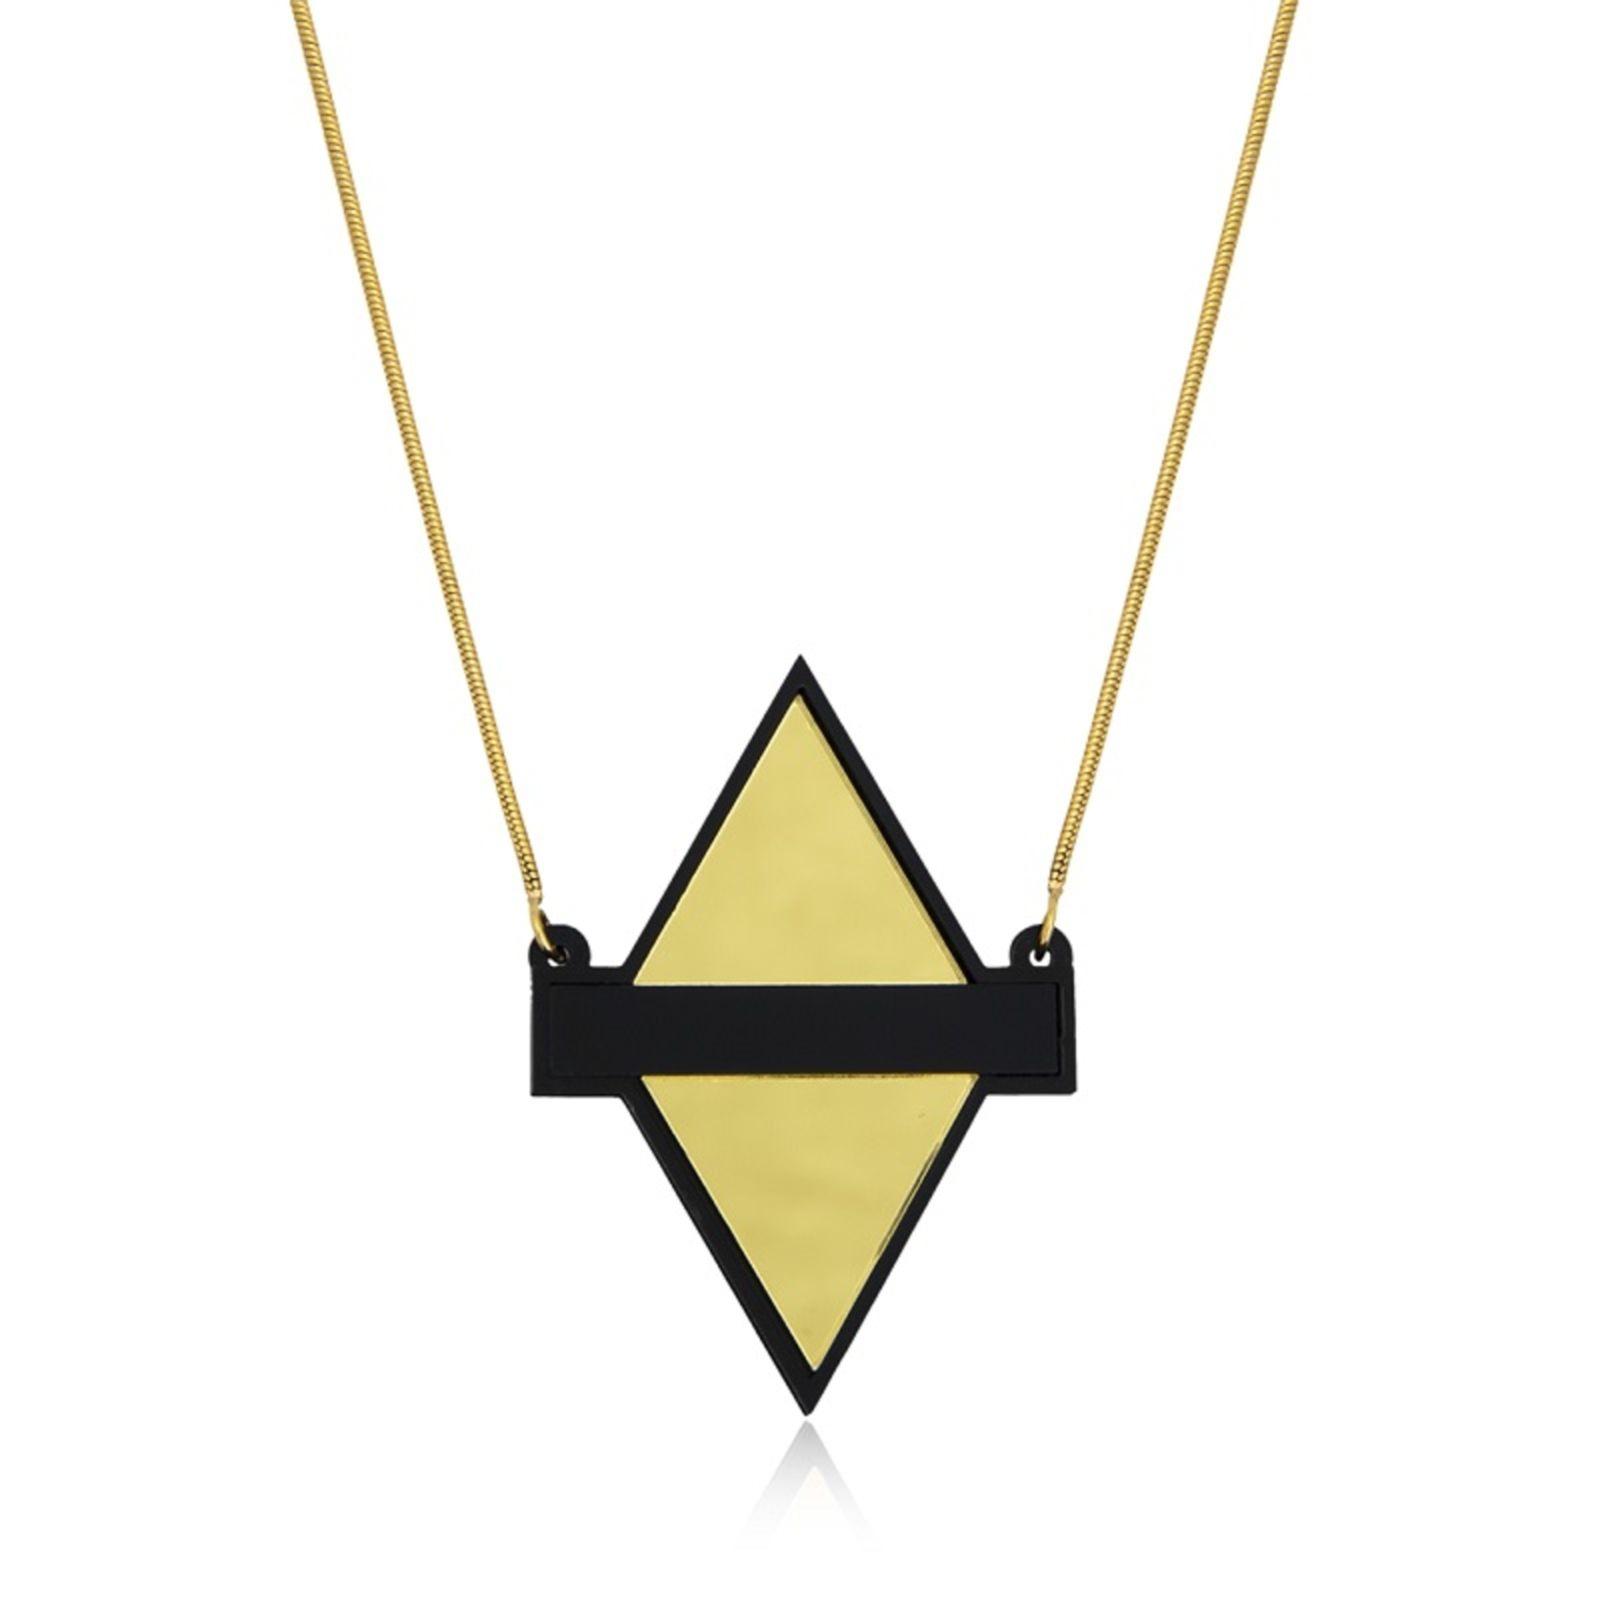 Colar Le Diamond Losango de Acrílico